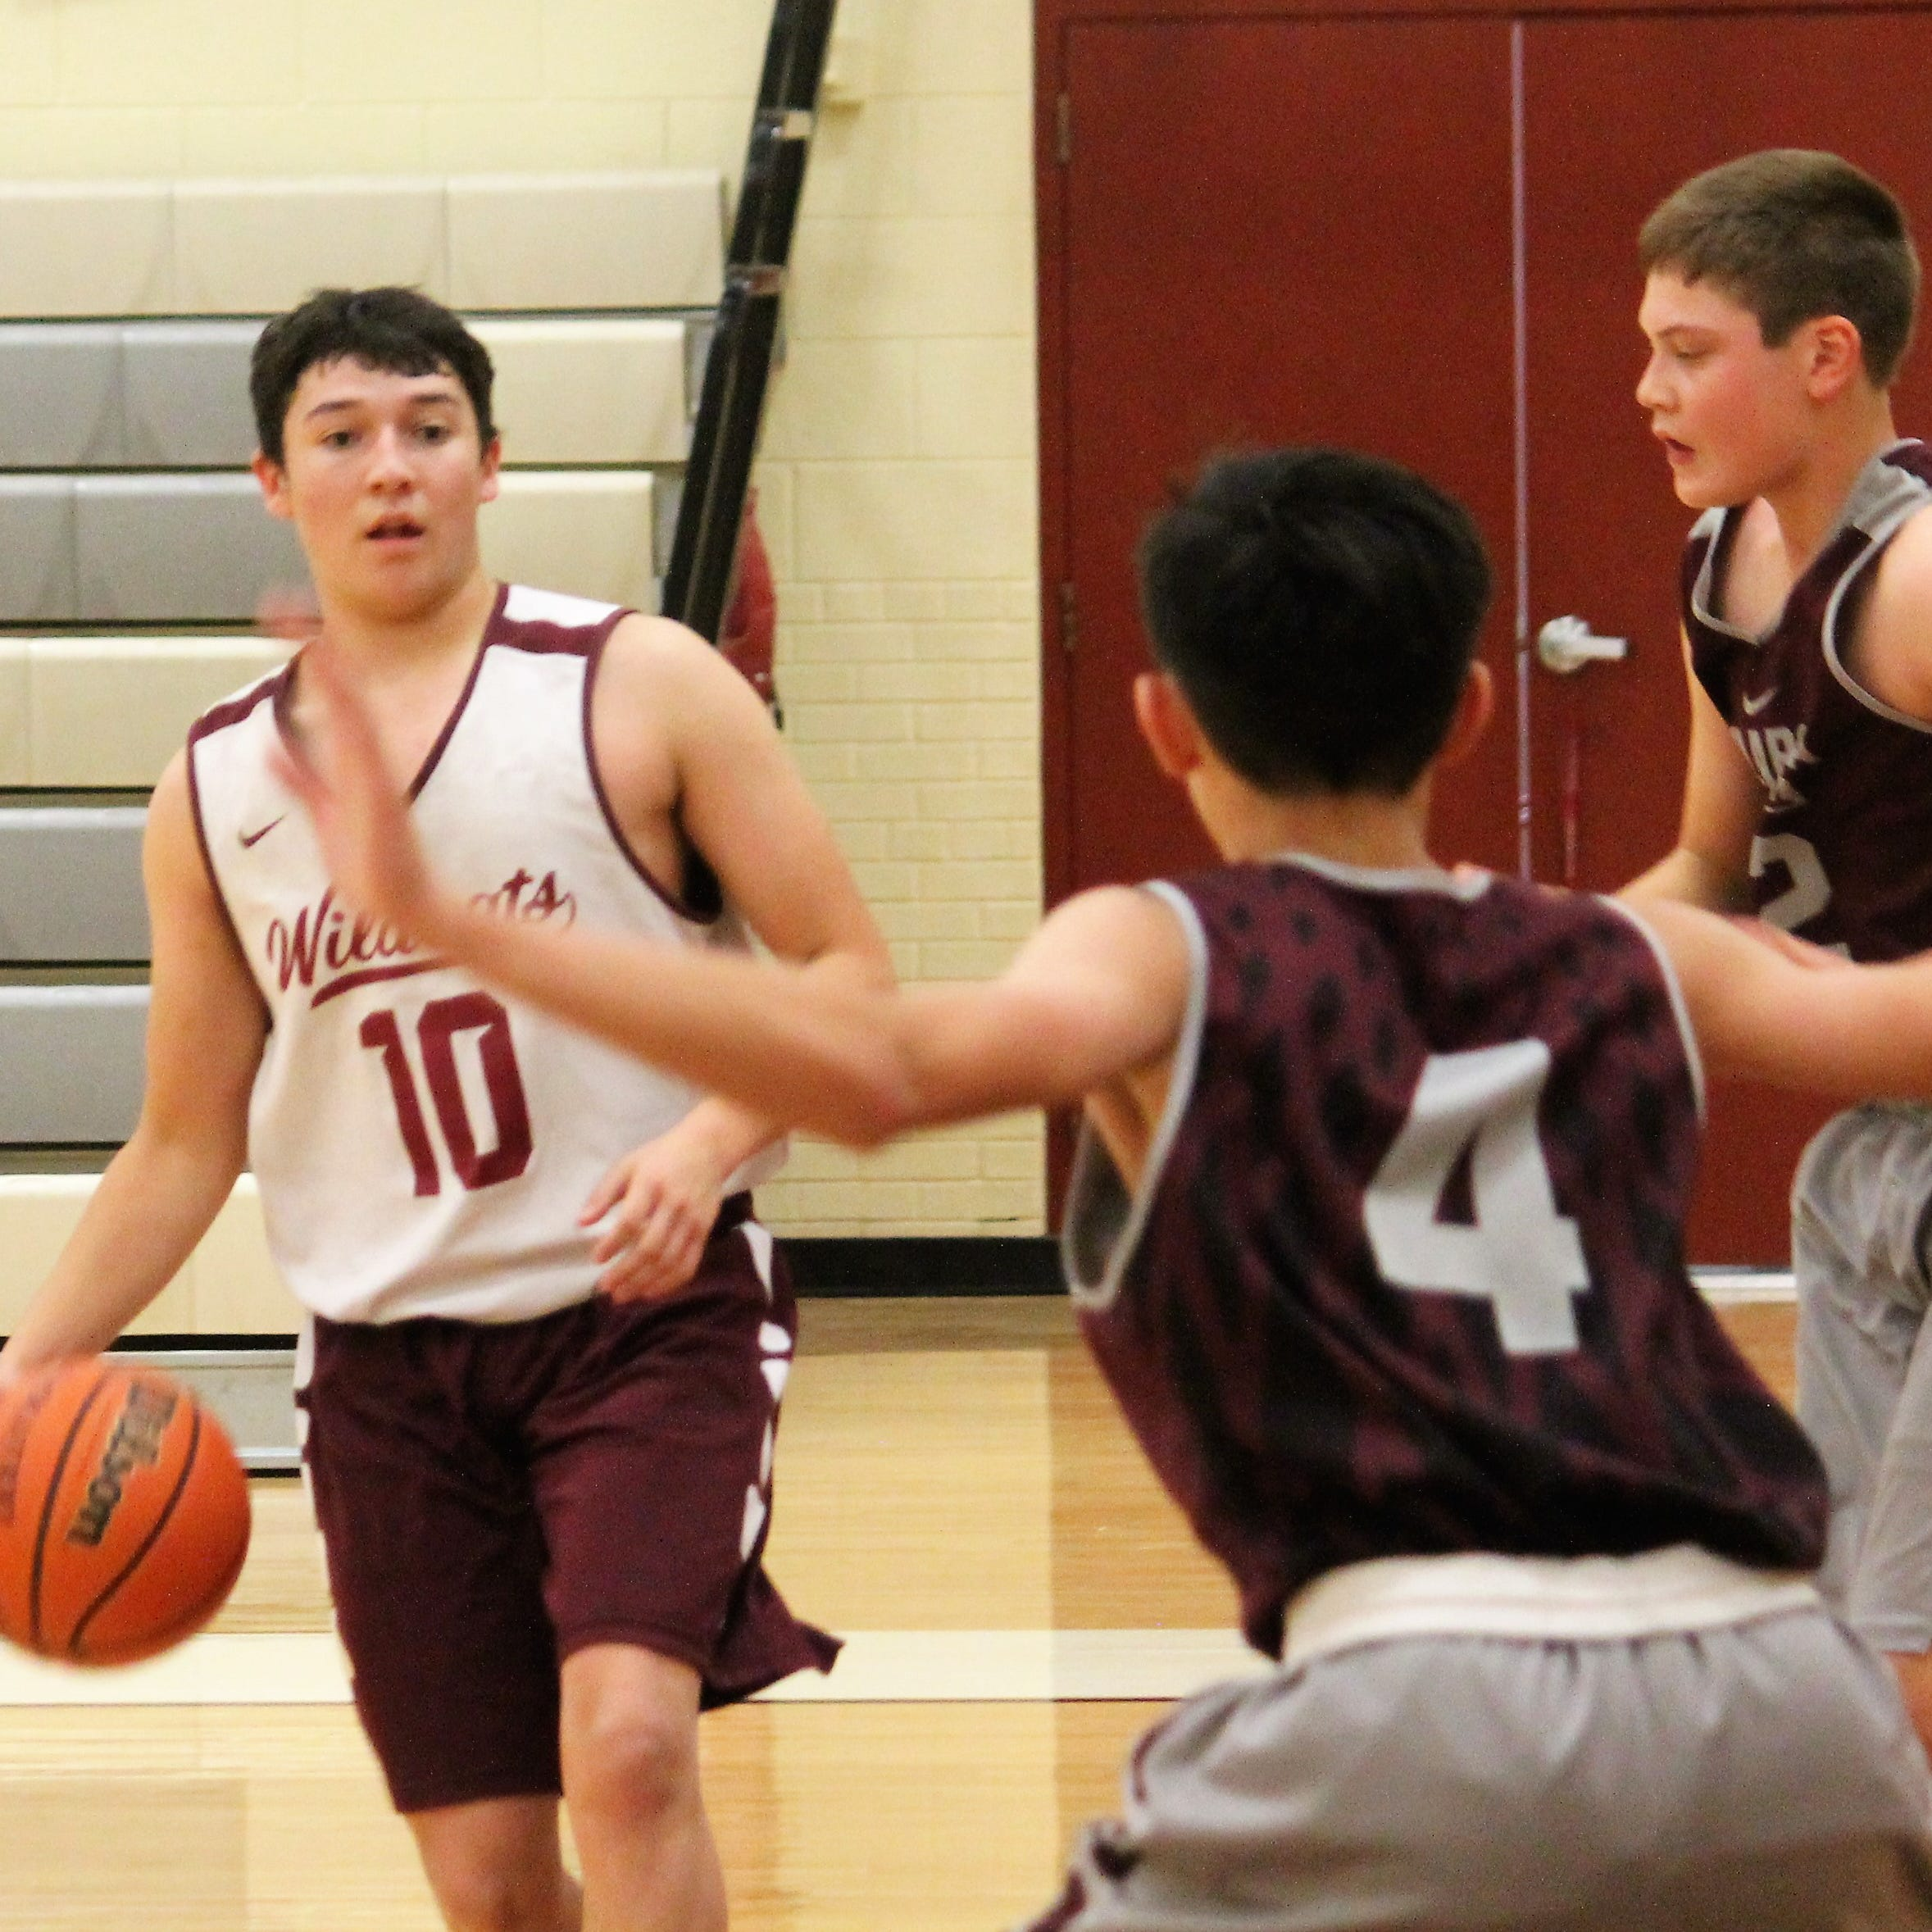 Tularosa boys basketball aiming for 2nd district championship